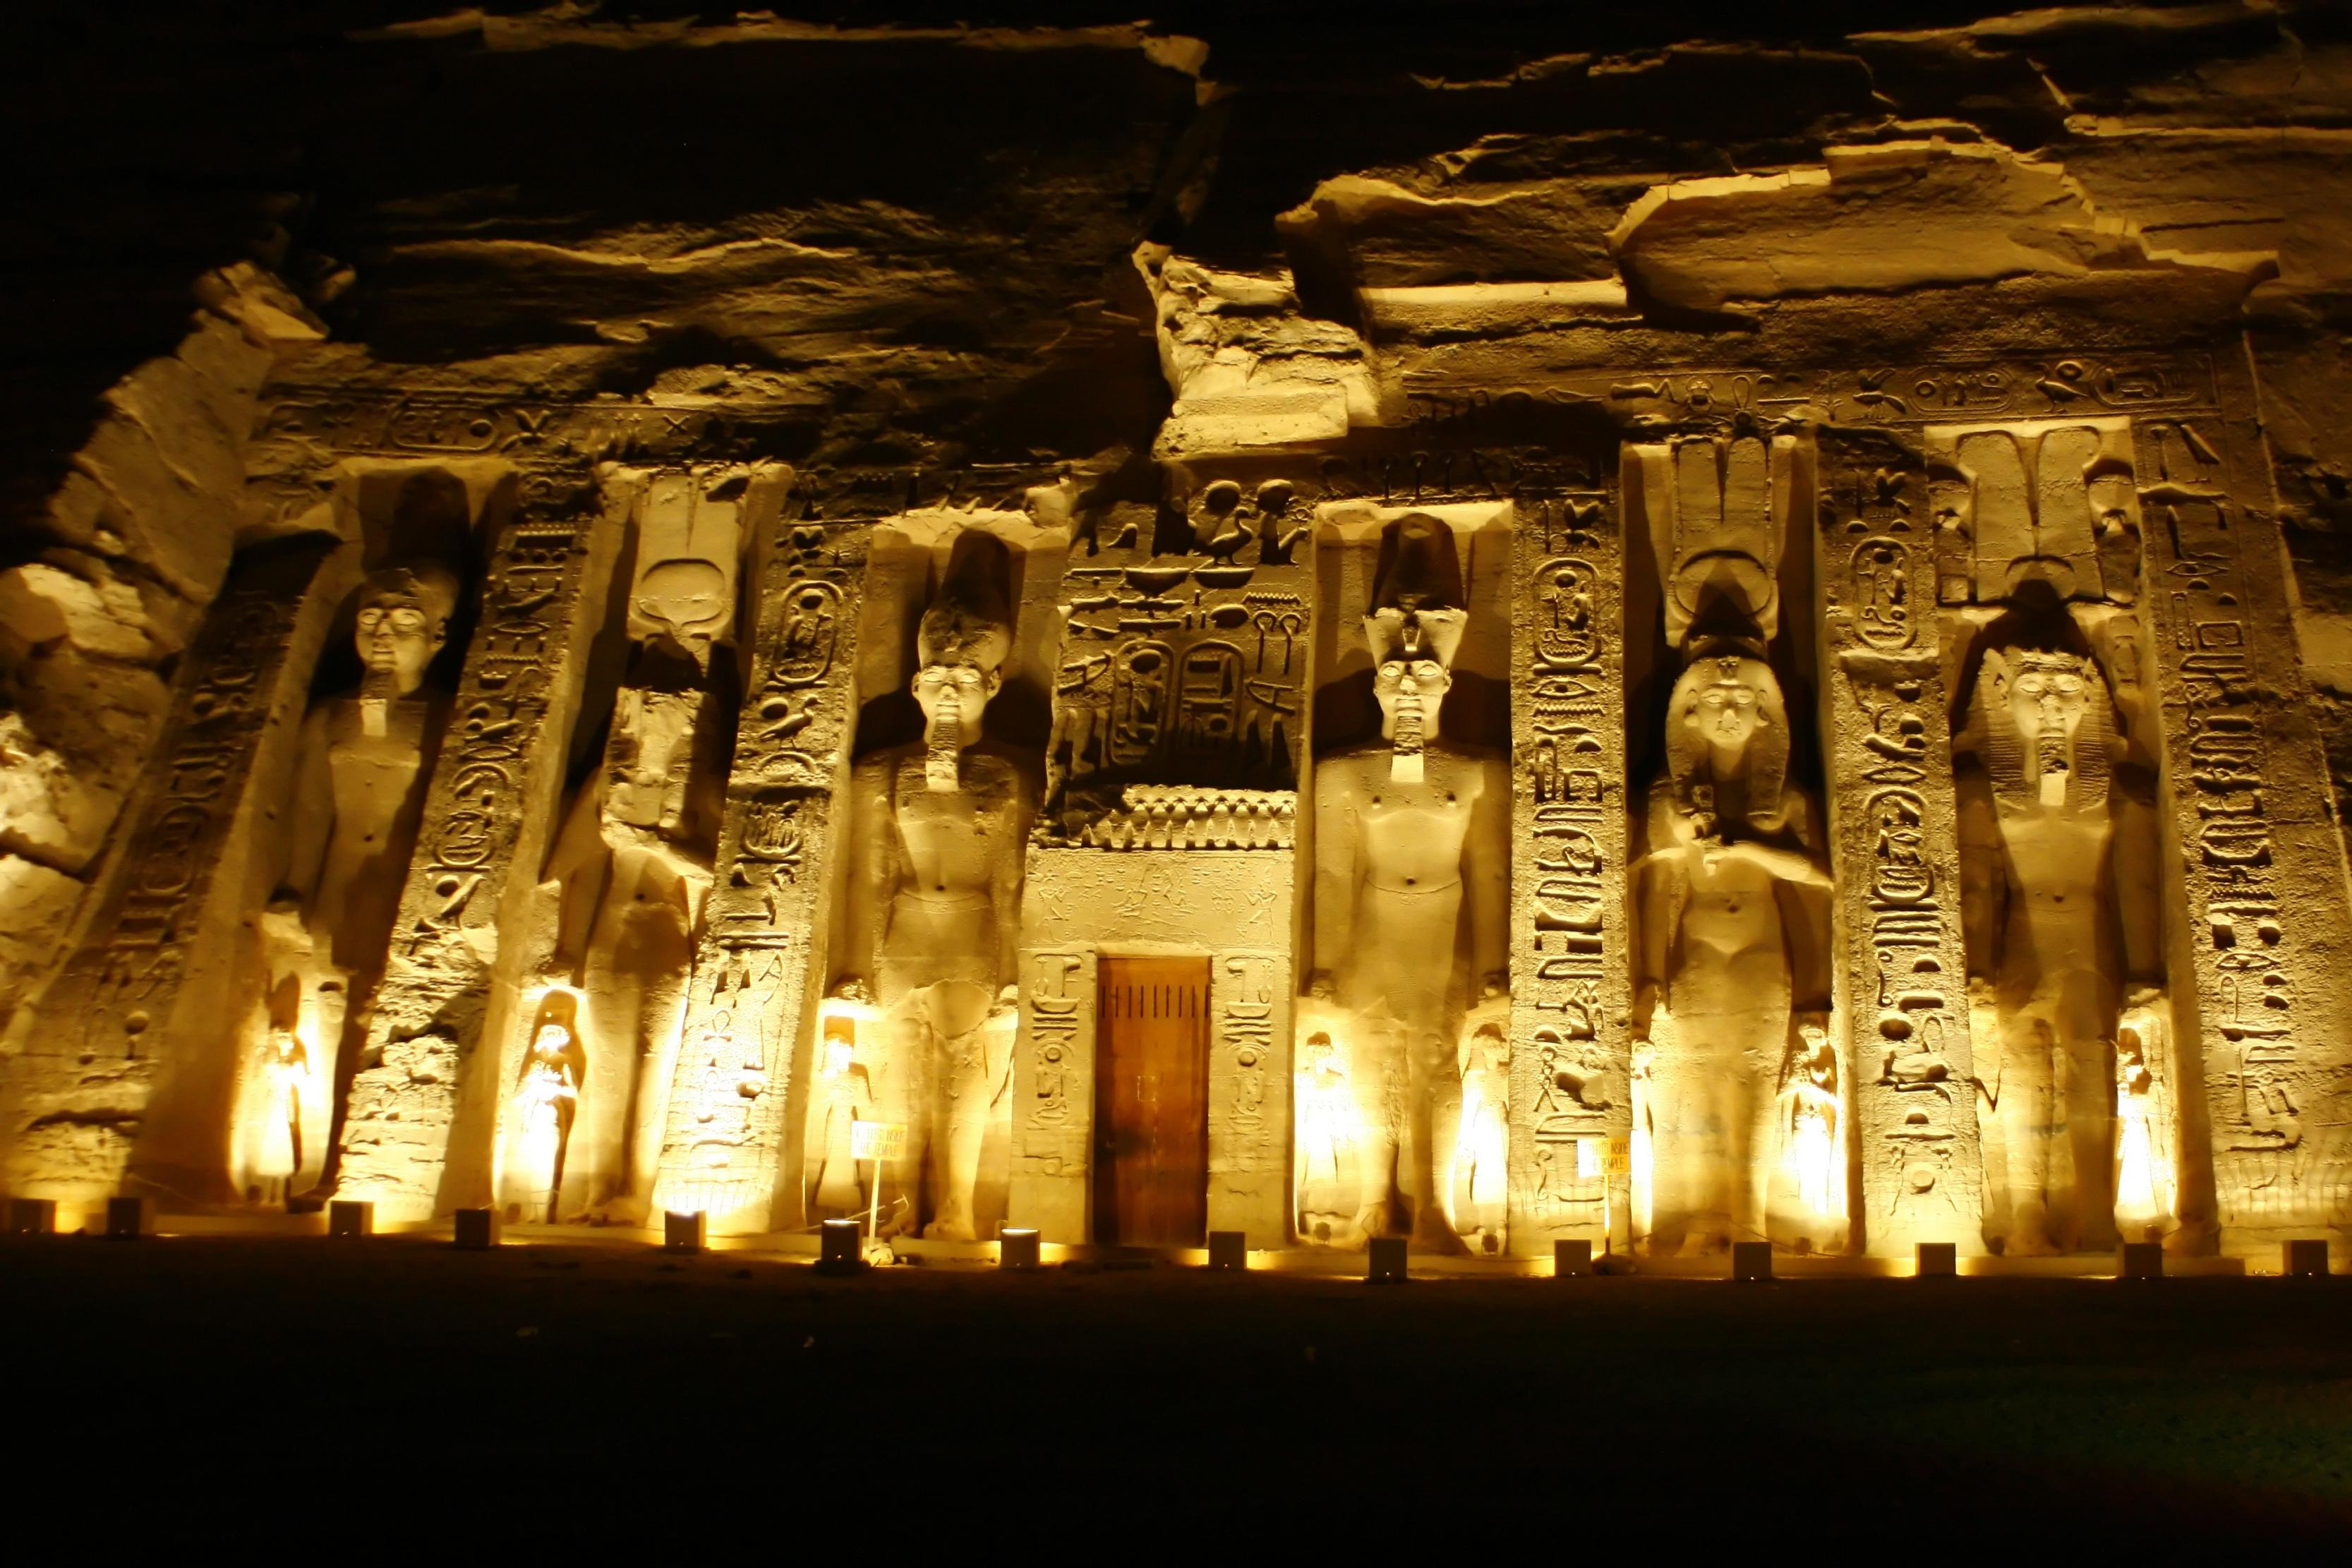 بالصور صور عن مصر , اجمل الصور عن مصر 169